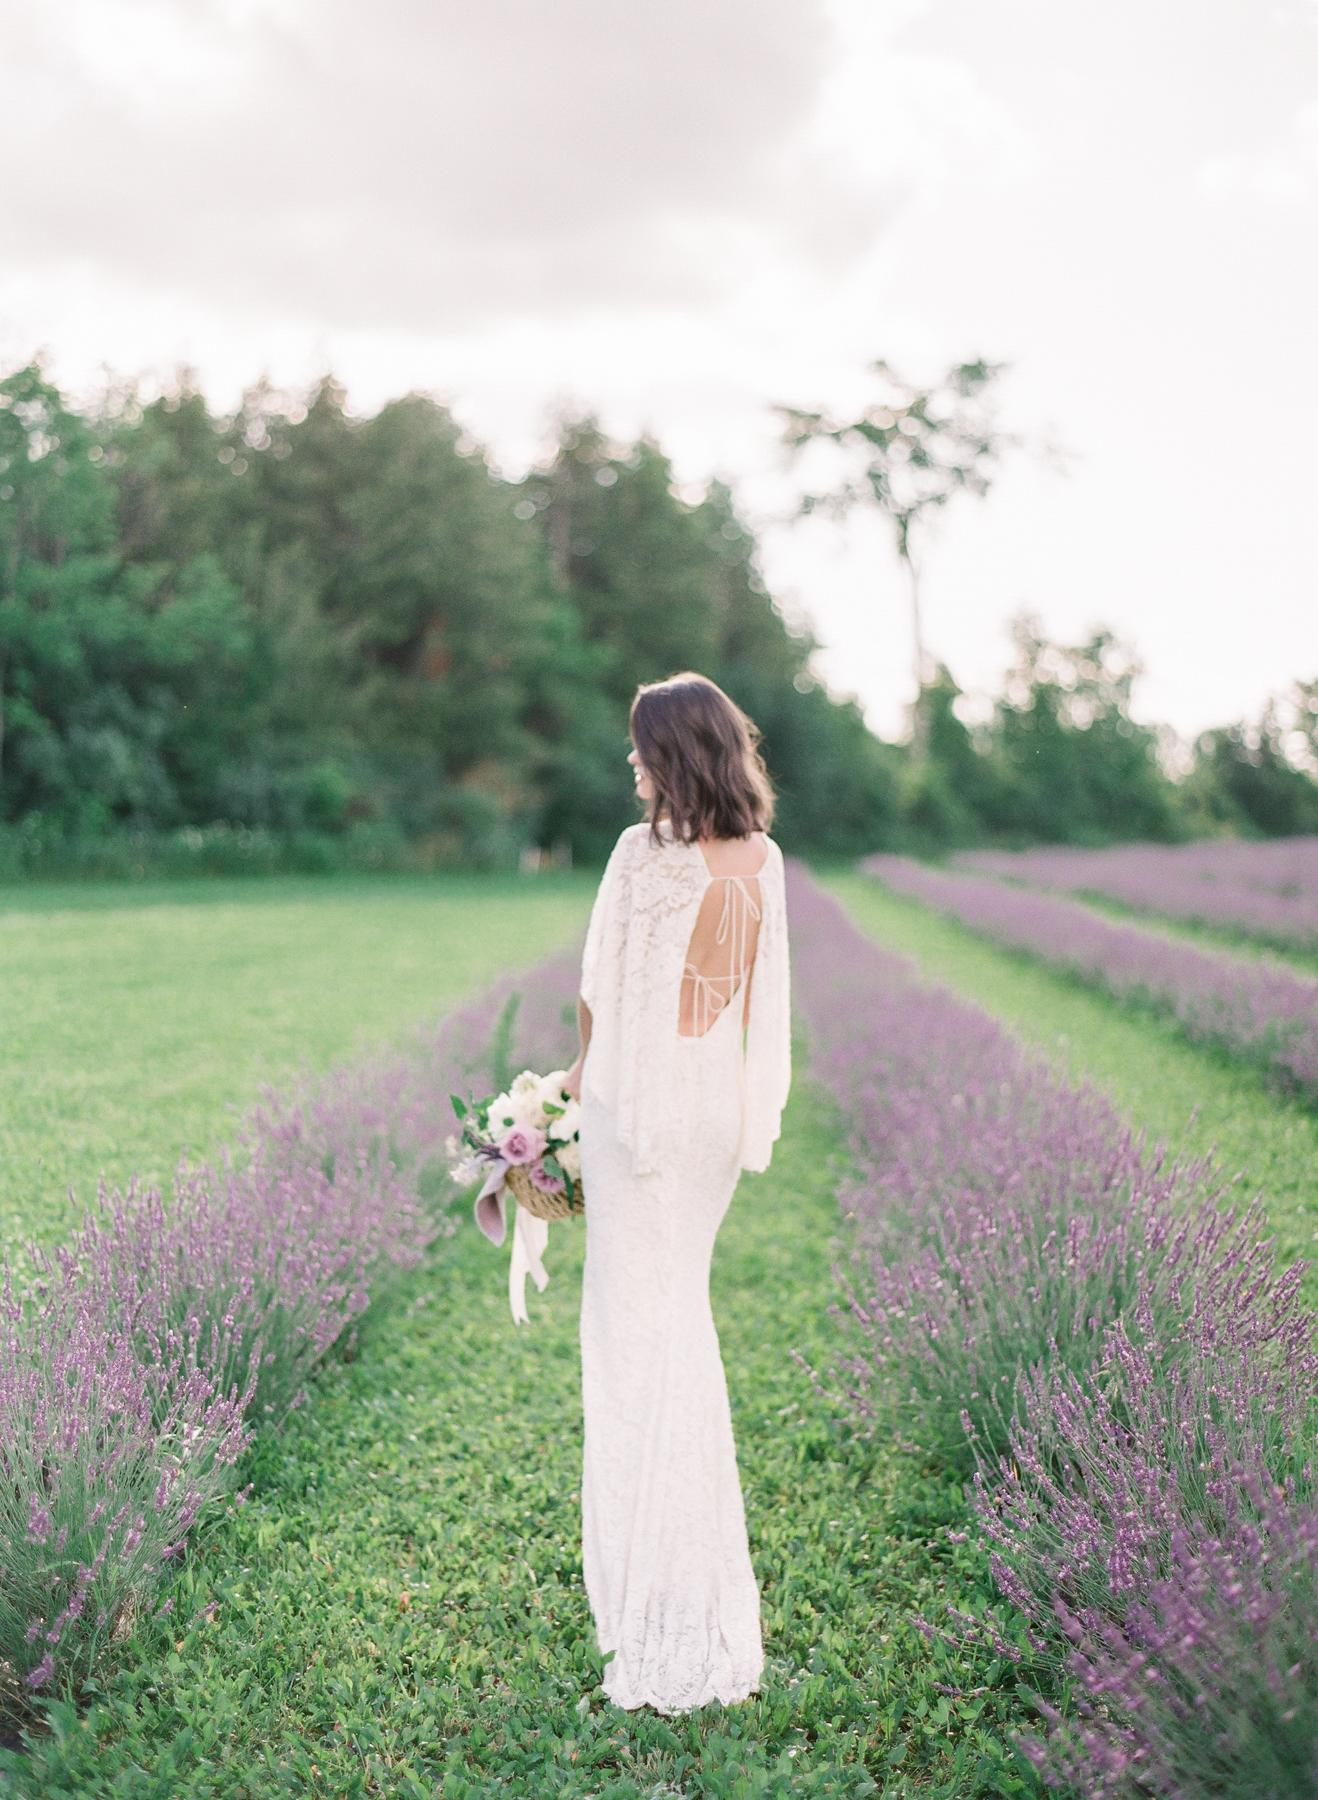 artiese-lavender-wedding-inspiration-000061980003